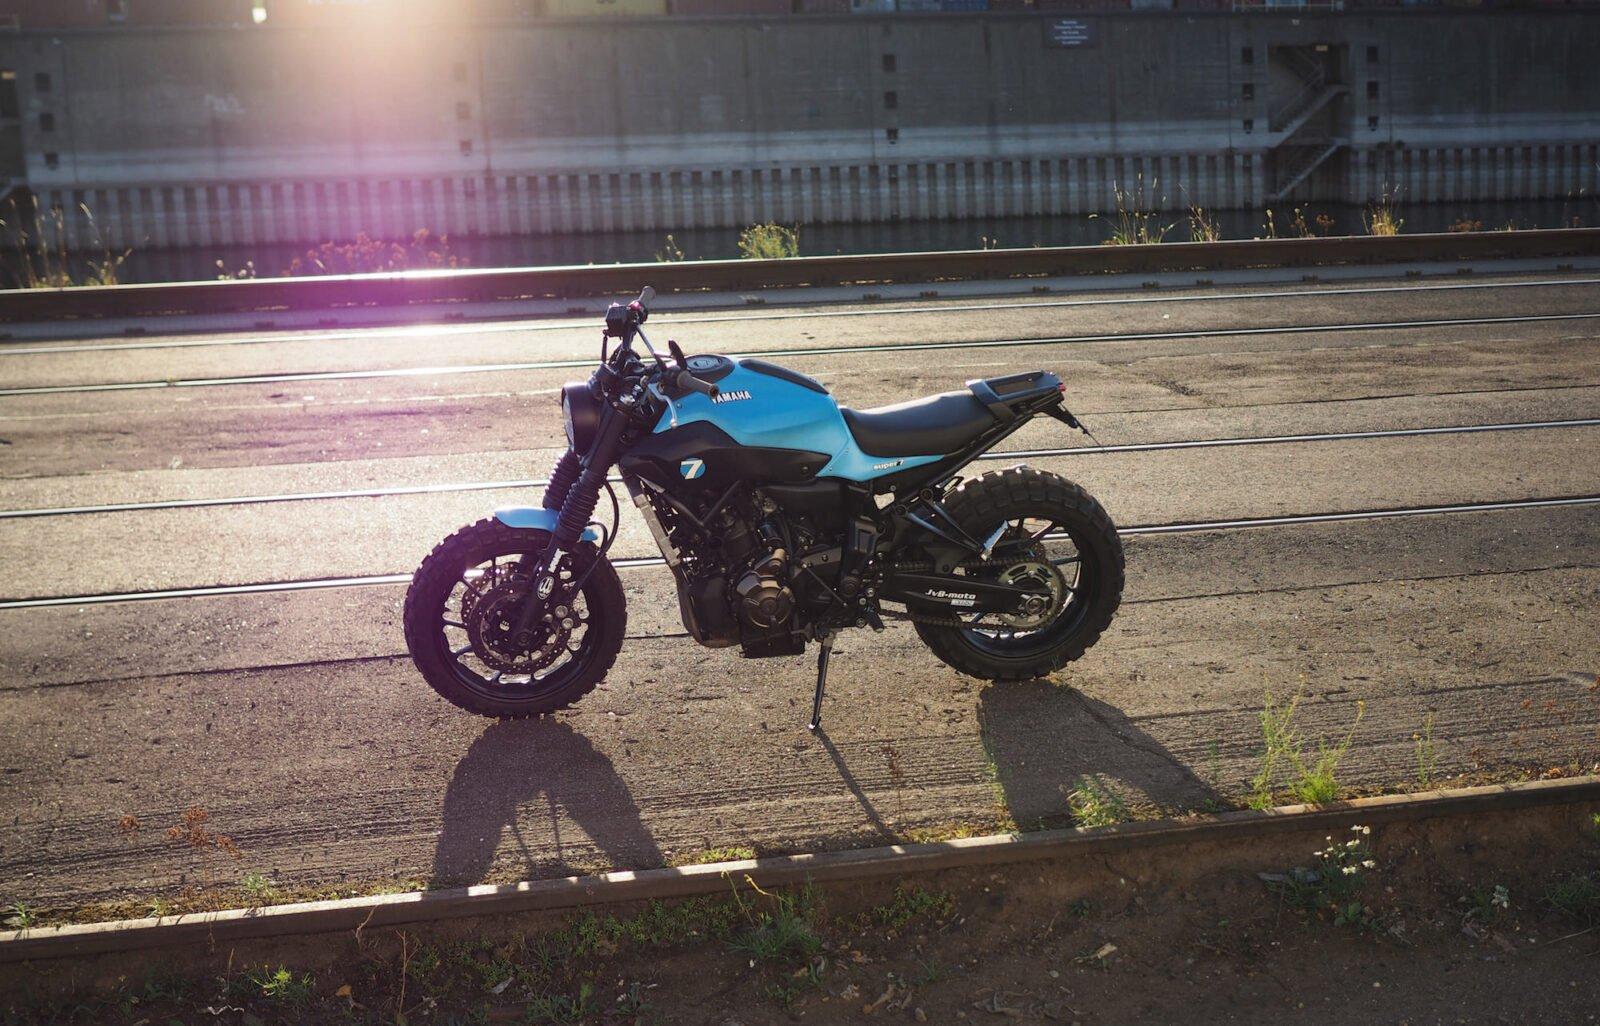 Yamaha MT 07 14 1600x1026 - JvB-moto Yamaha MT-07